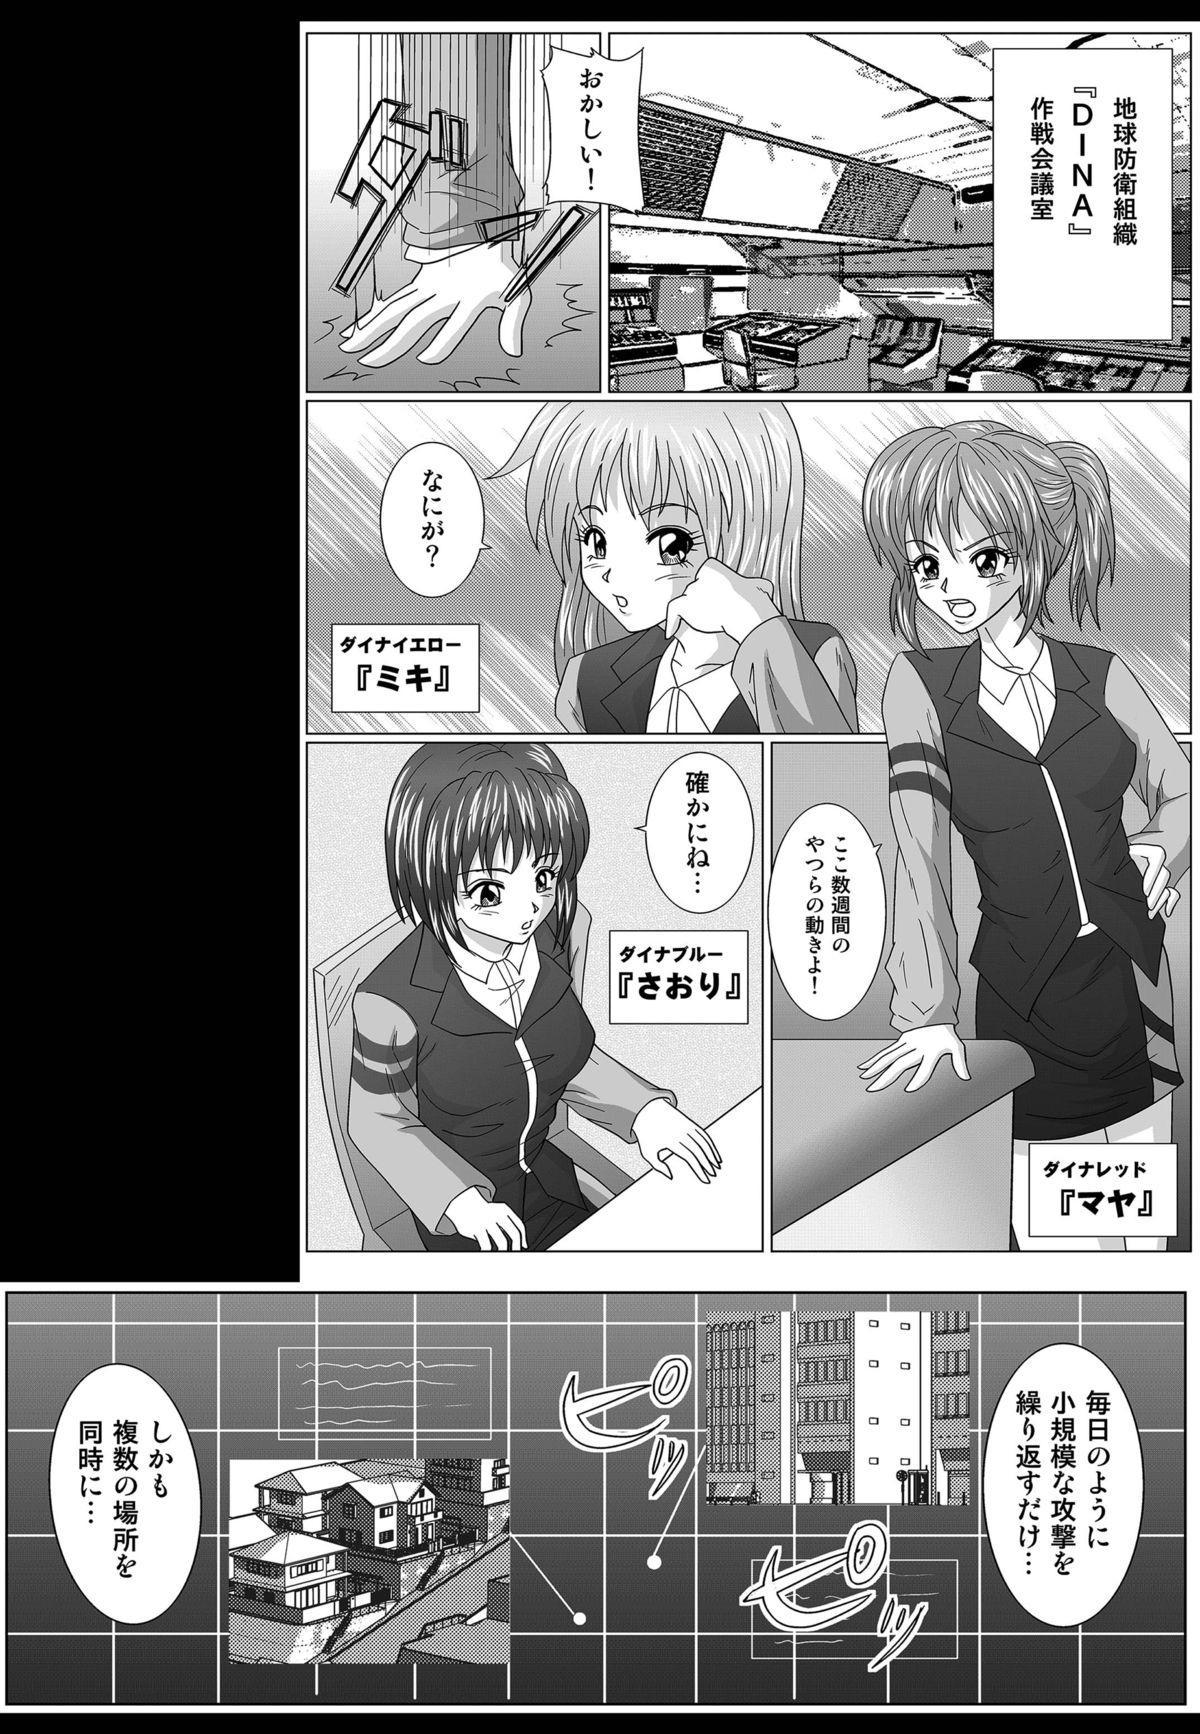 [Macxe's (monmon)] Tokubousentai Dinaranger ~Heroine Kairaku Sennou Keikaku~ Vol.01/02/03 (Renkaban) [Digital] 38